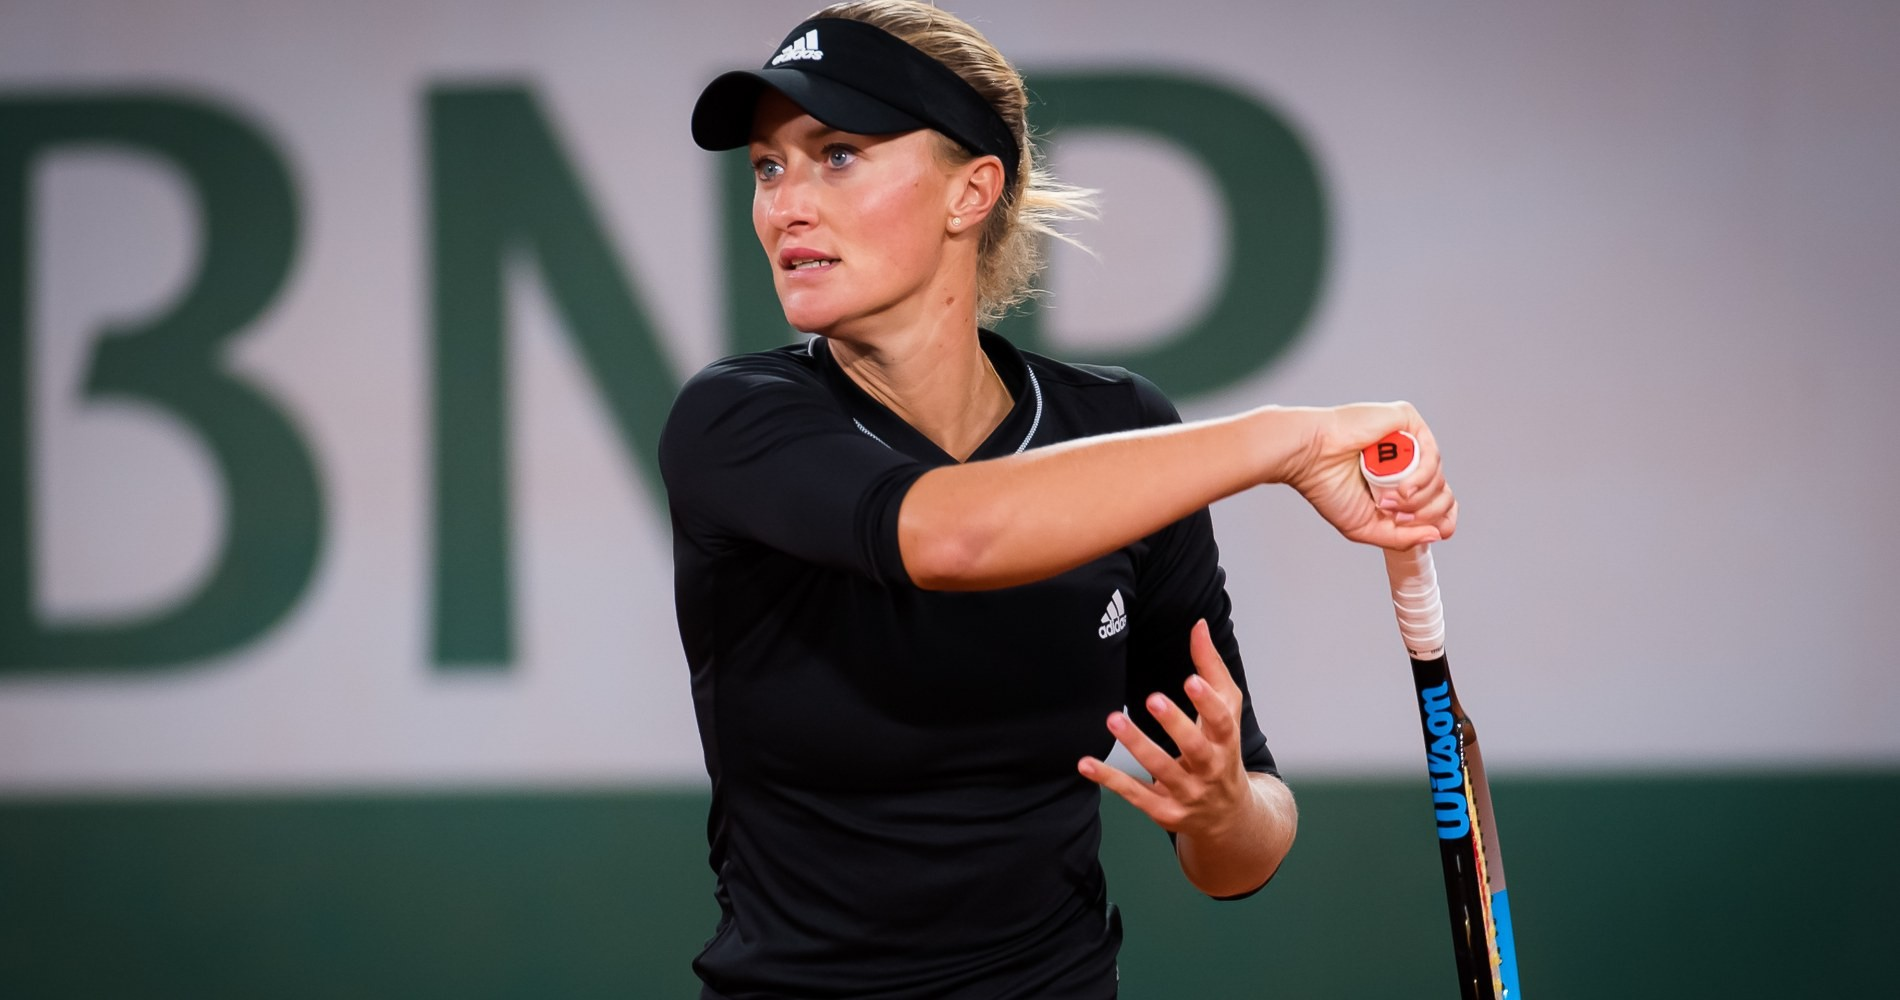 Mladenovic Roland Garros 2020